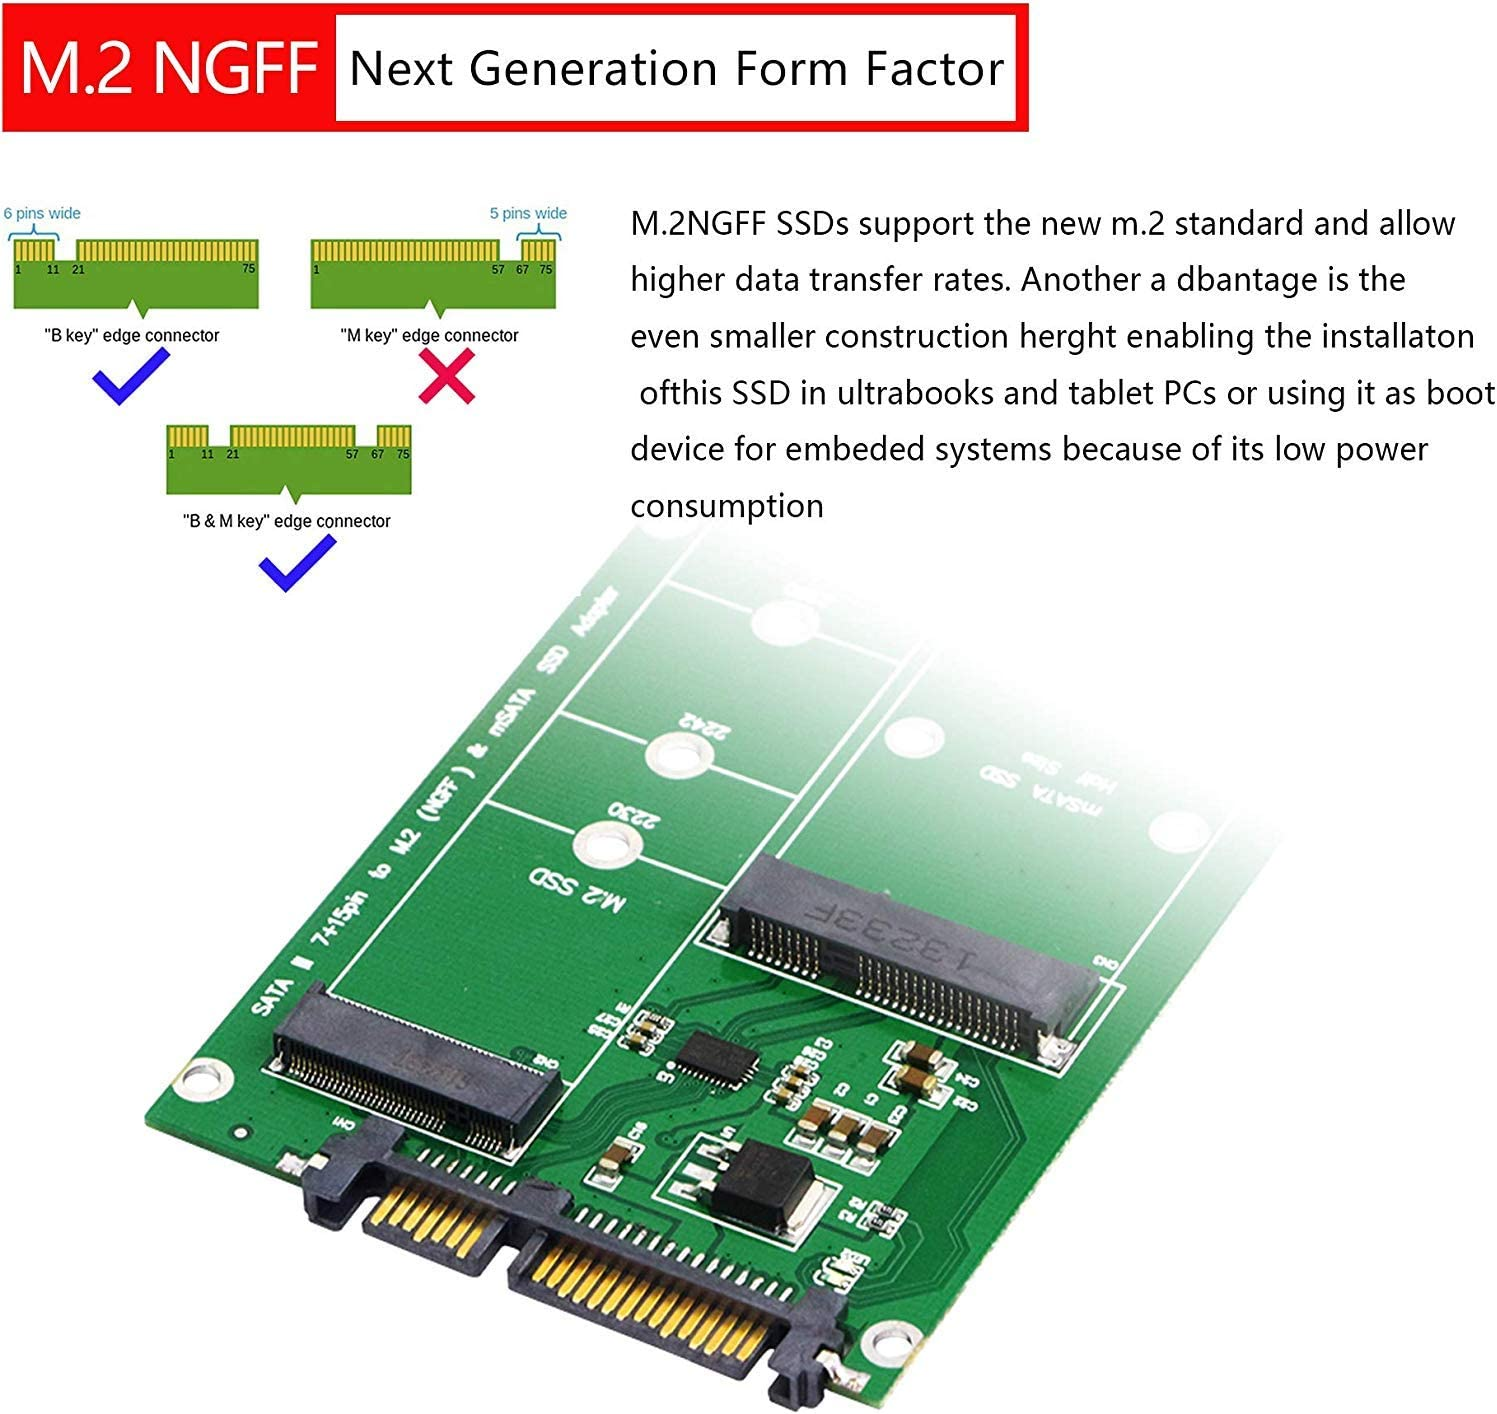 Cablecc Combo Mini PCI-E 2 Lane M.2 NGFF /& mSATA SSD to SATA 3.0 Adapter PCB